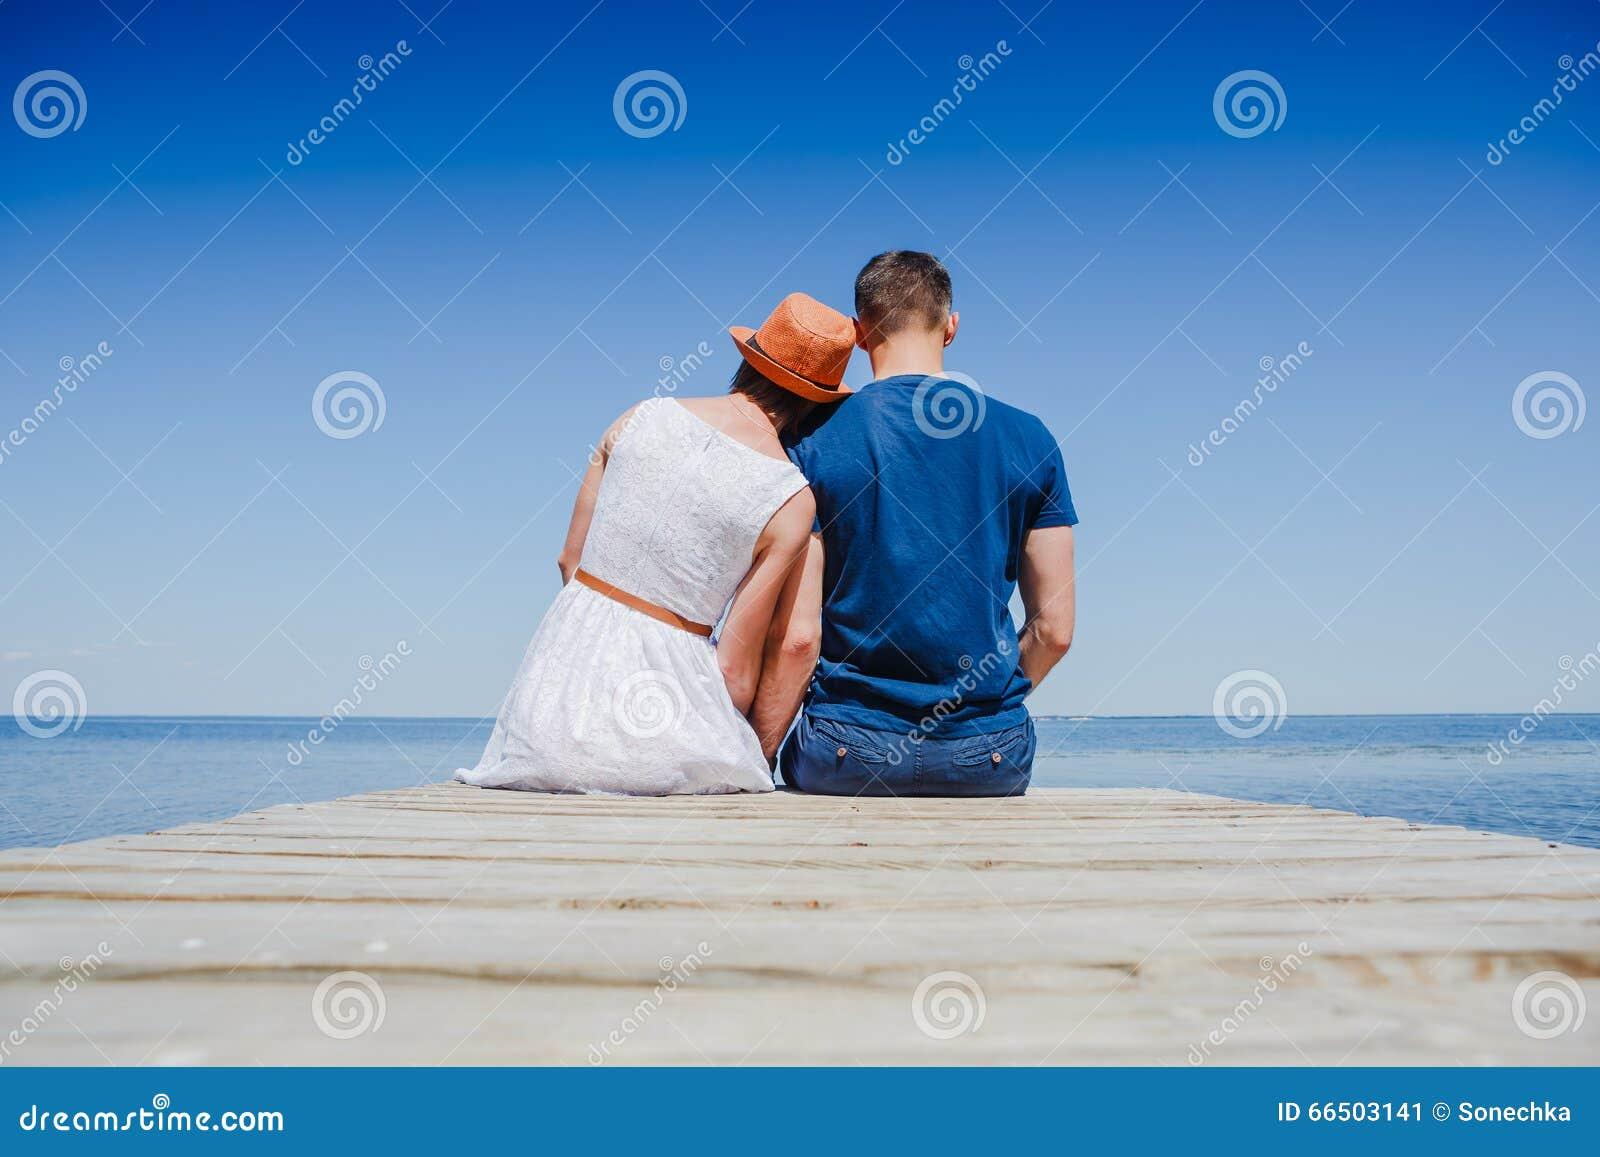 Beach couple enjoying fun romantic vacation holiday